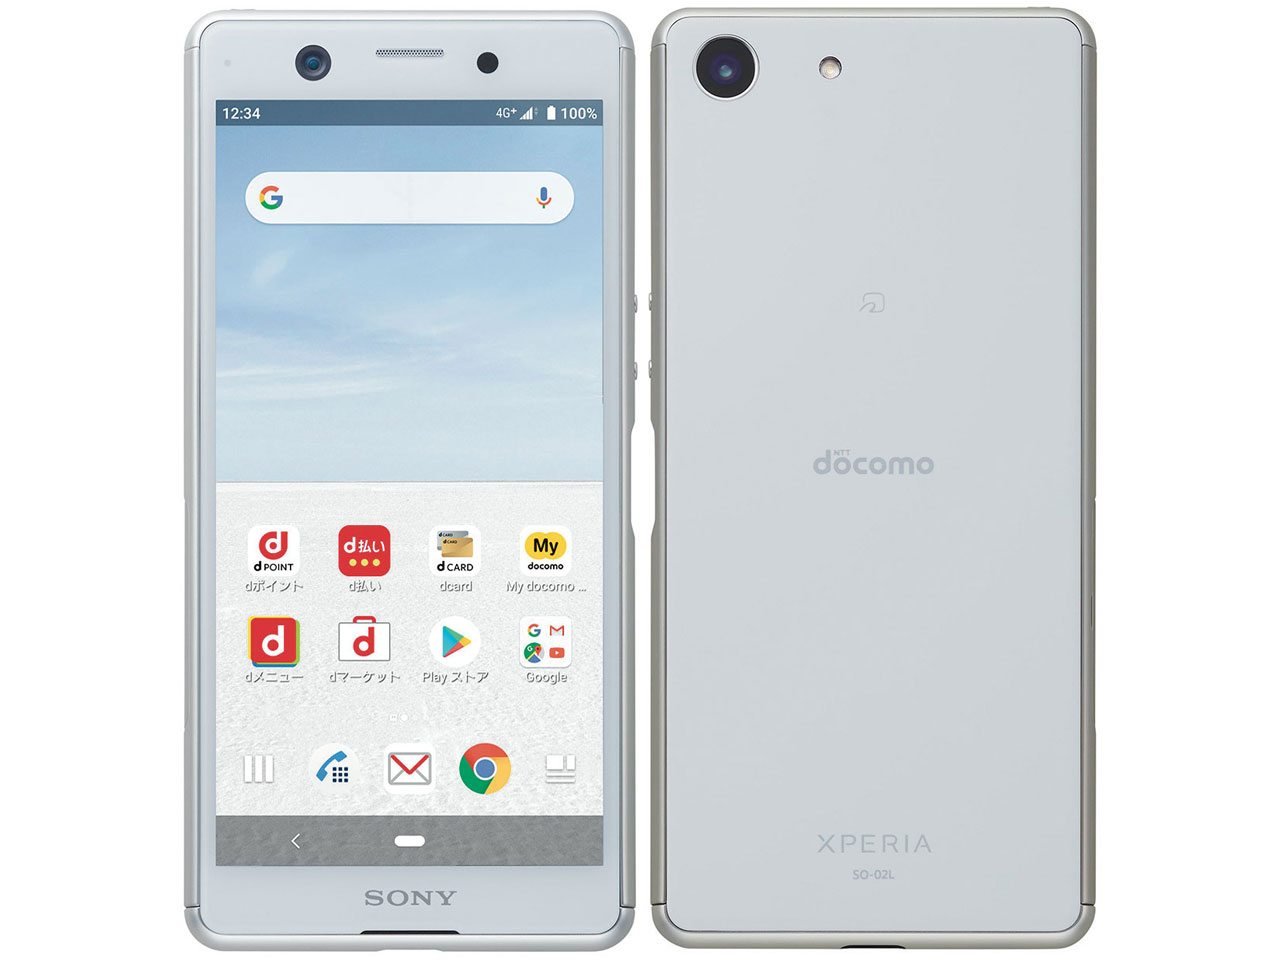 docomo SO-02L Xperia Ace SIMフリー 本体 新品未使用 正規SIMロック解除済み ホワイト White 白...